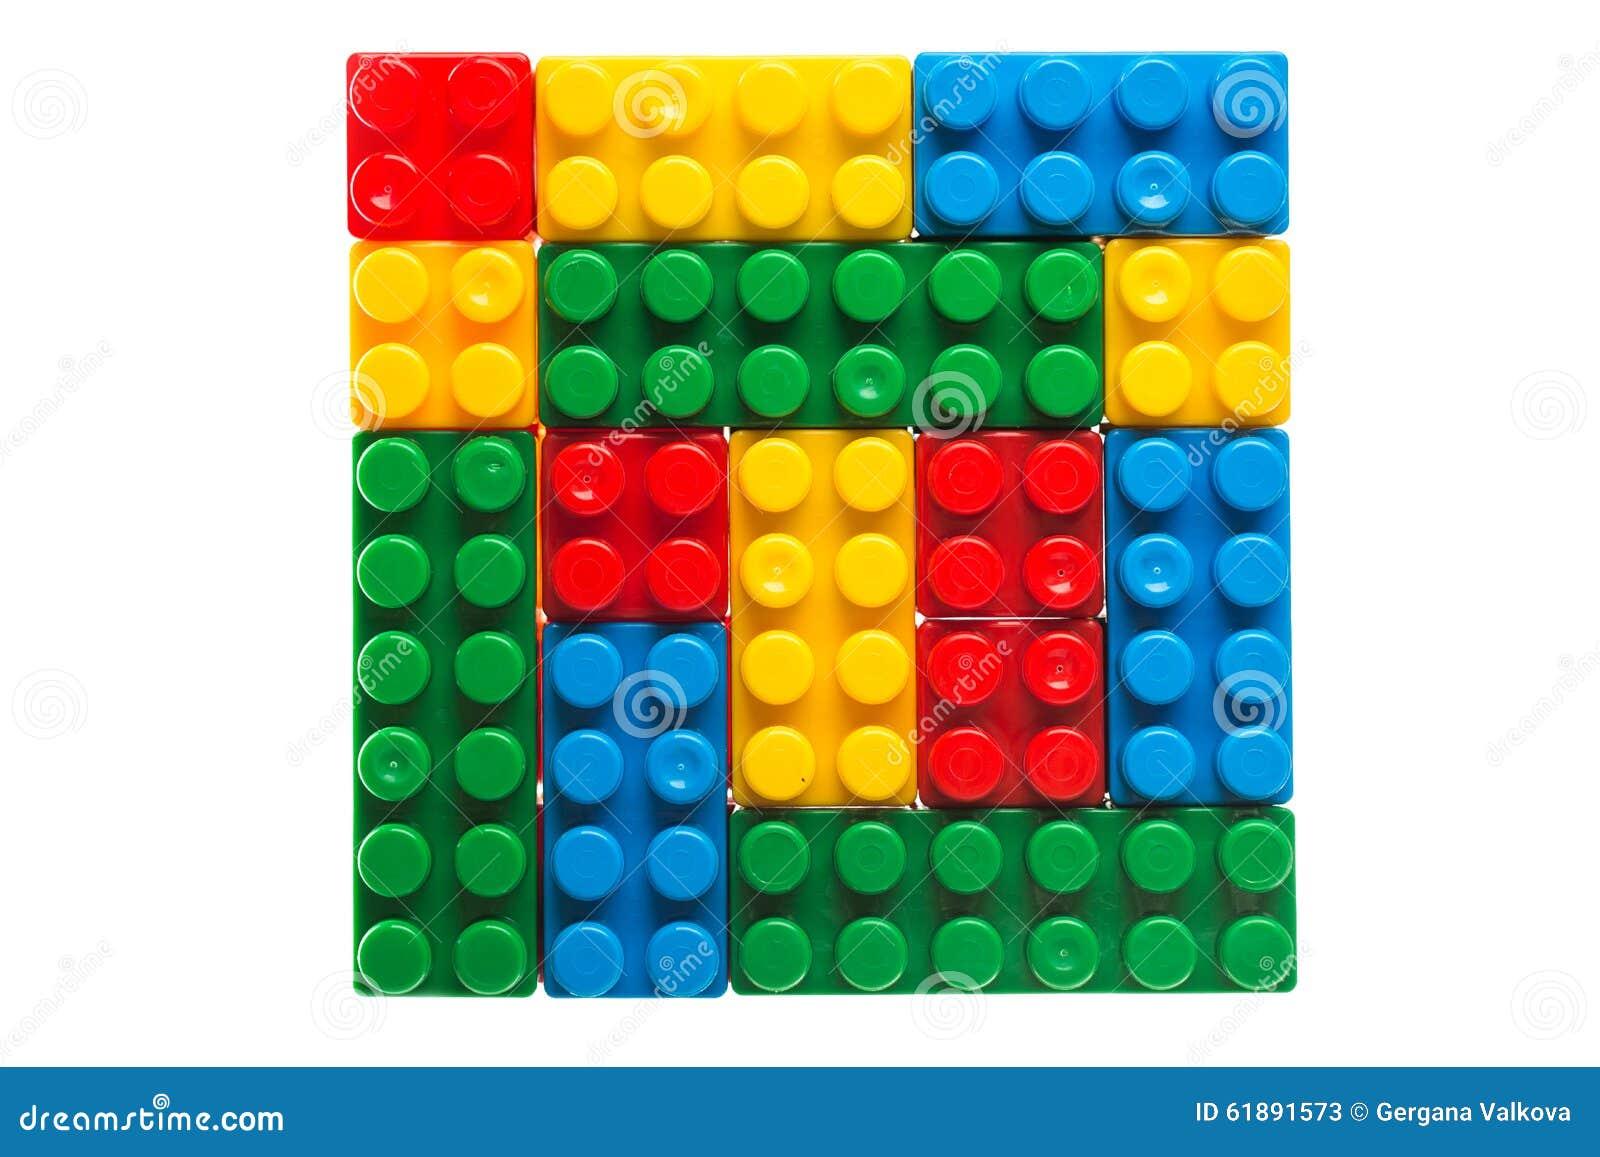 Plastic Building Blocks Or Lego Cubes Isolated On White Stock Image